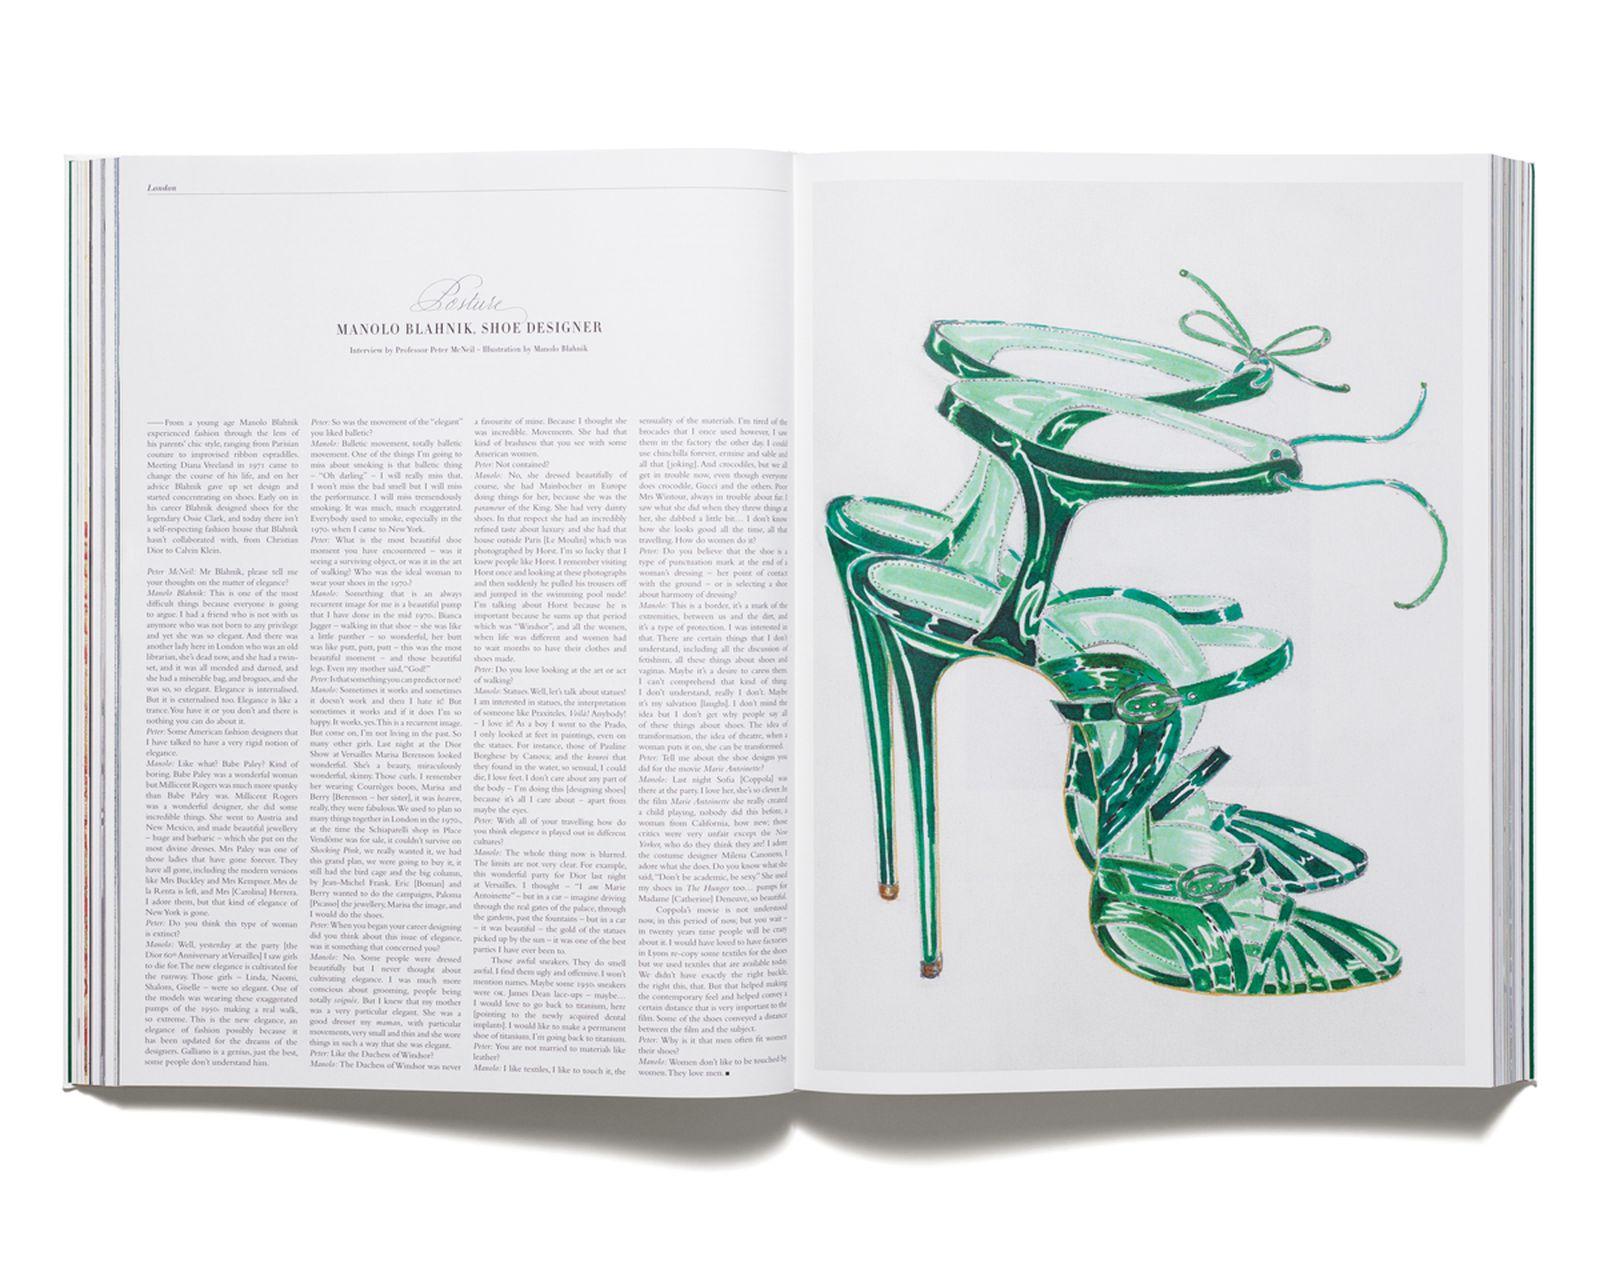 MANOLO BLAHNIK - Interview with Manolo Blahnik by Peter McNeil. Illustration by Manolo Blahnik.